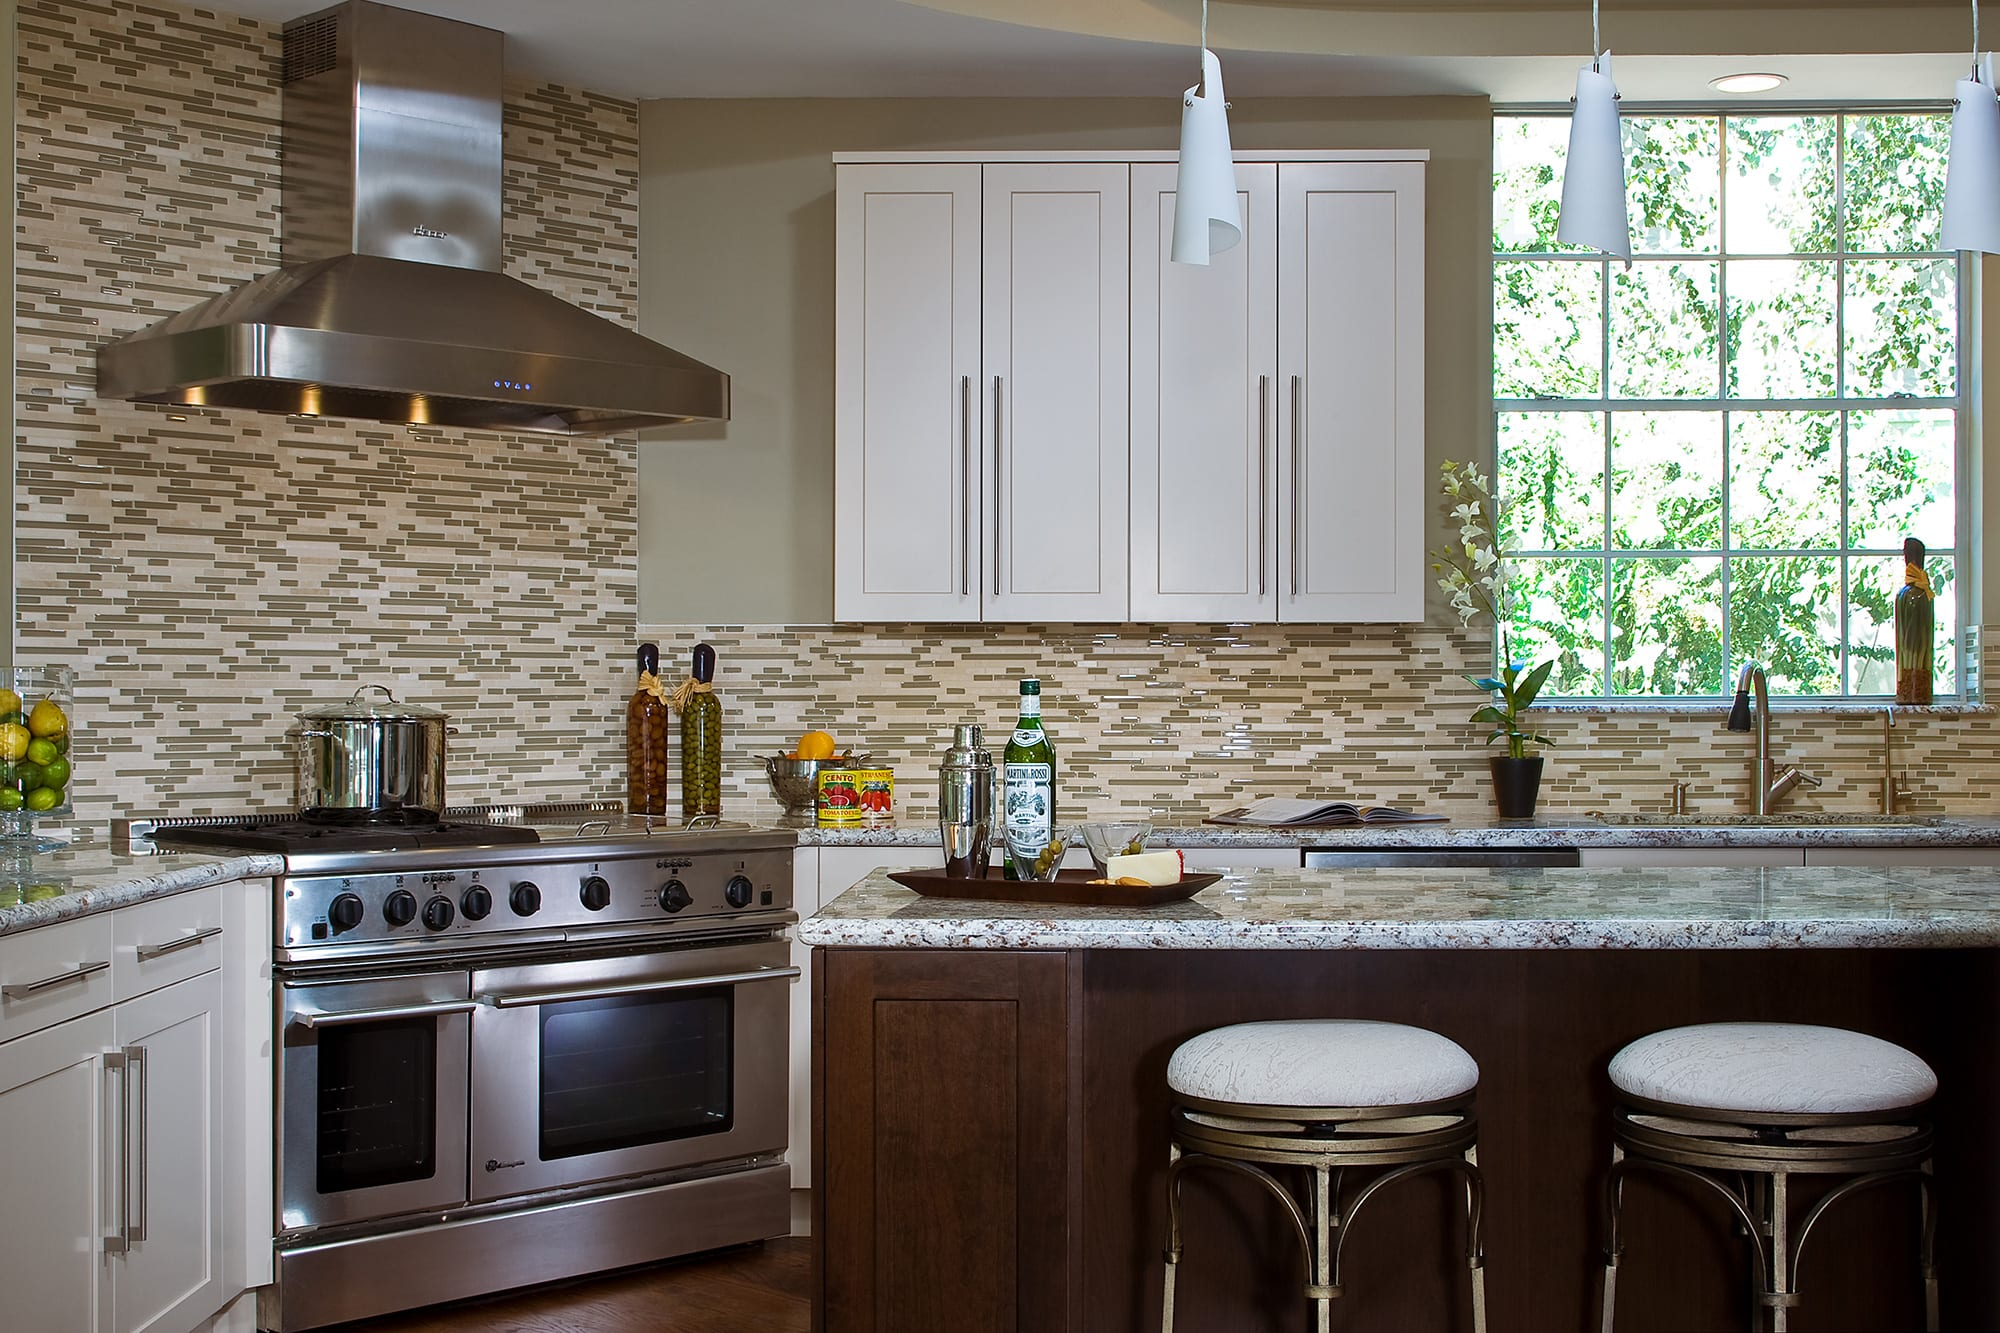 Bellmont Kitchen And Bath